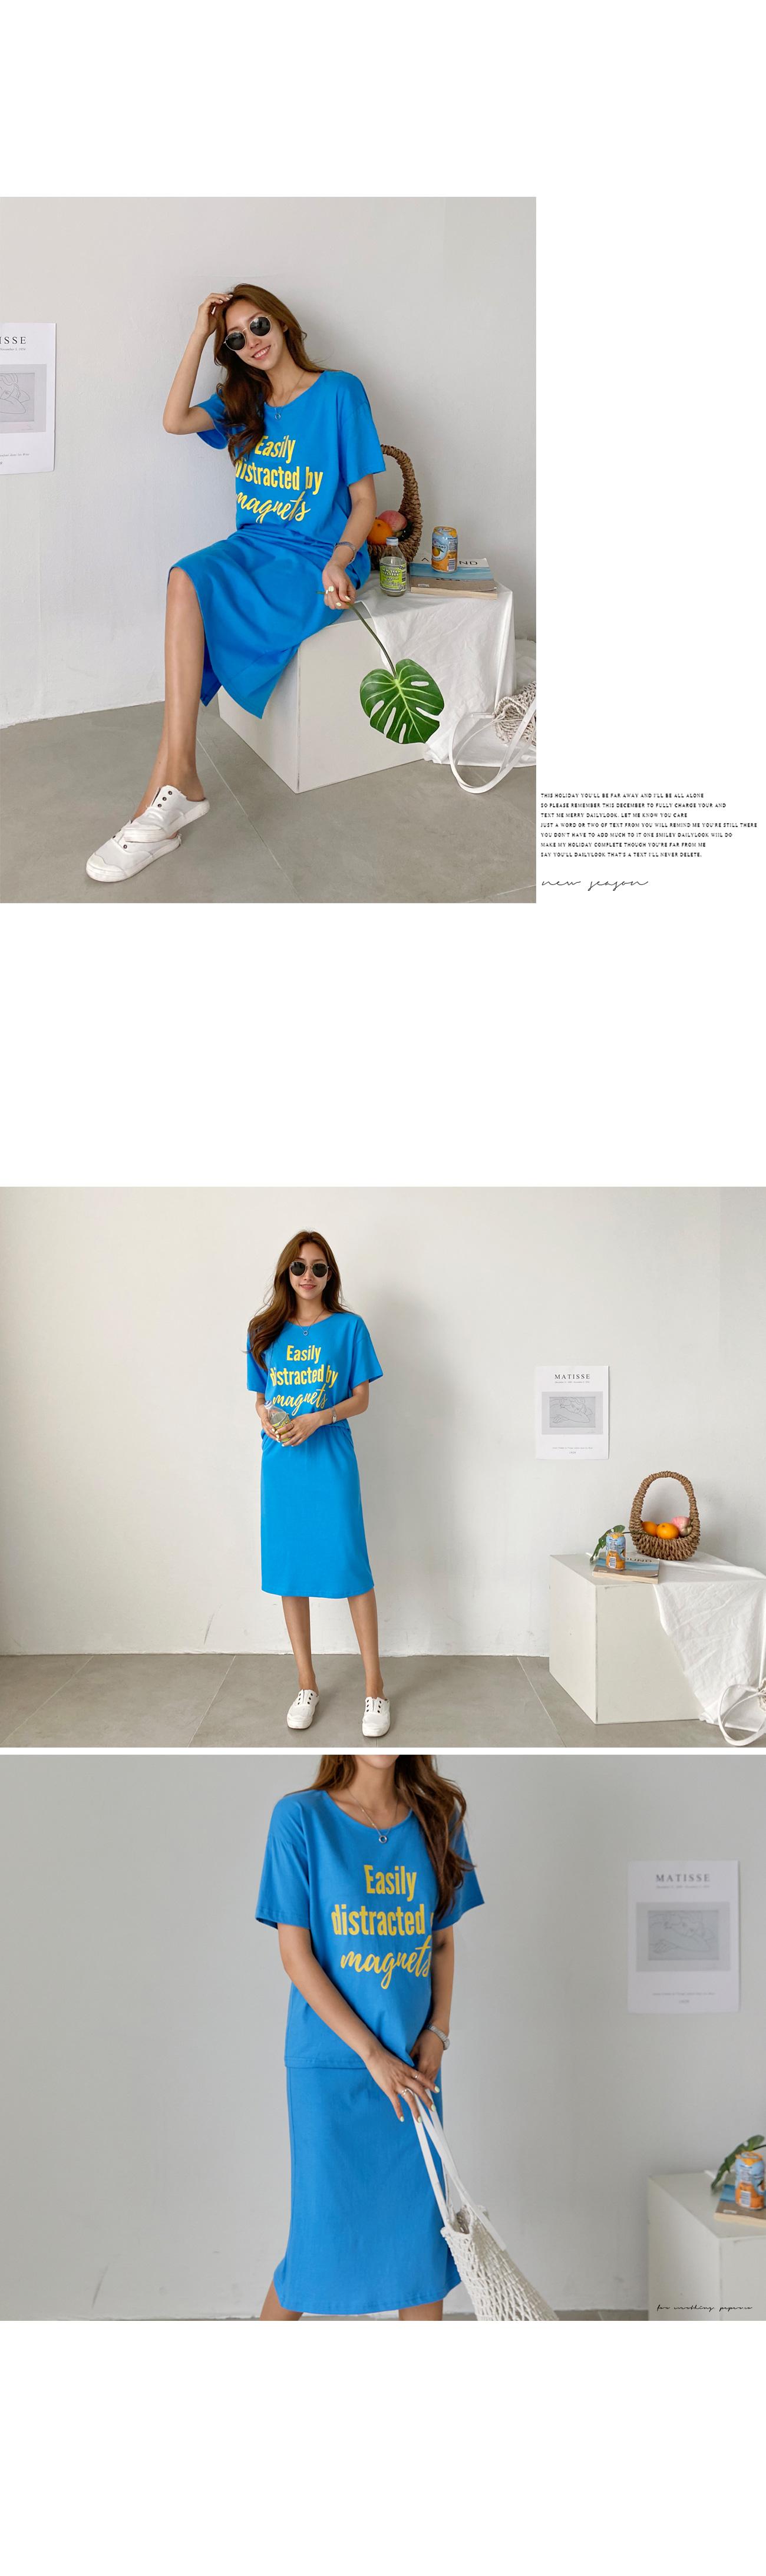 Easley Cotton Skirt Set #92558